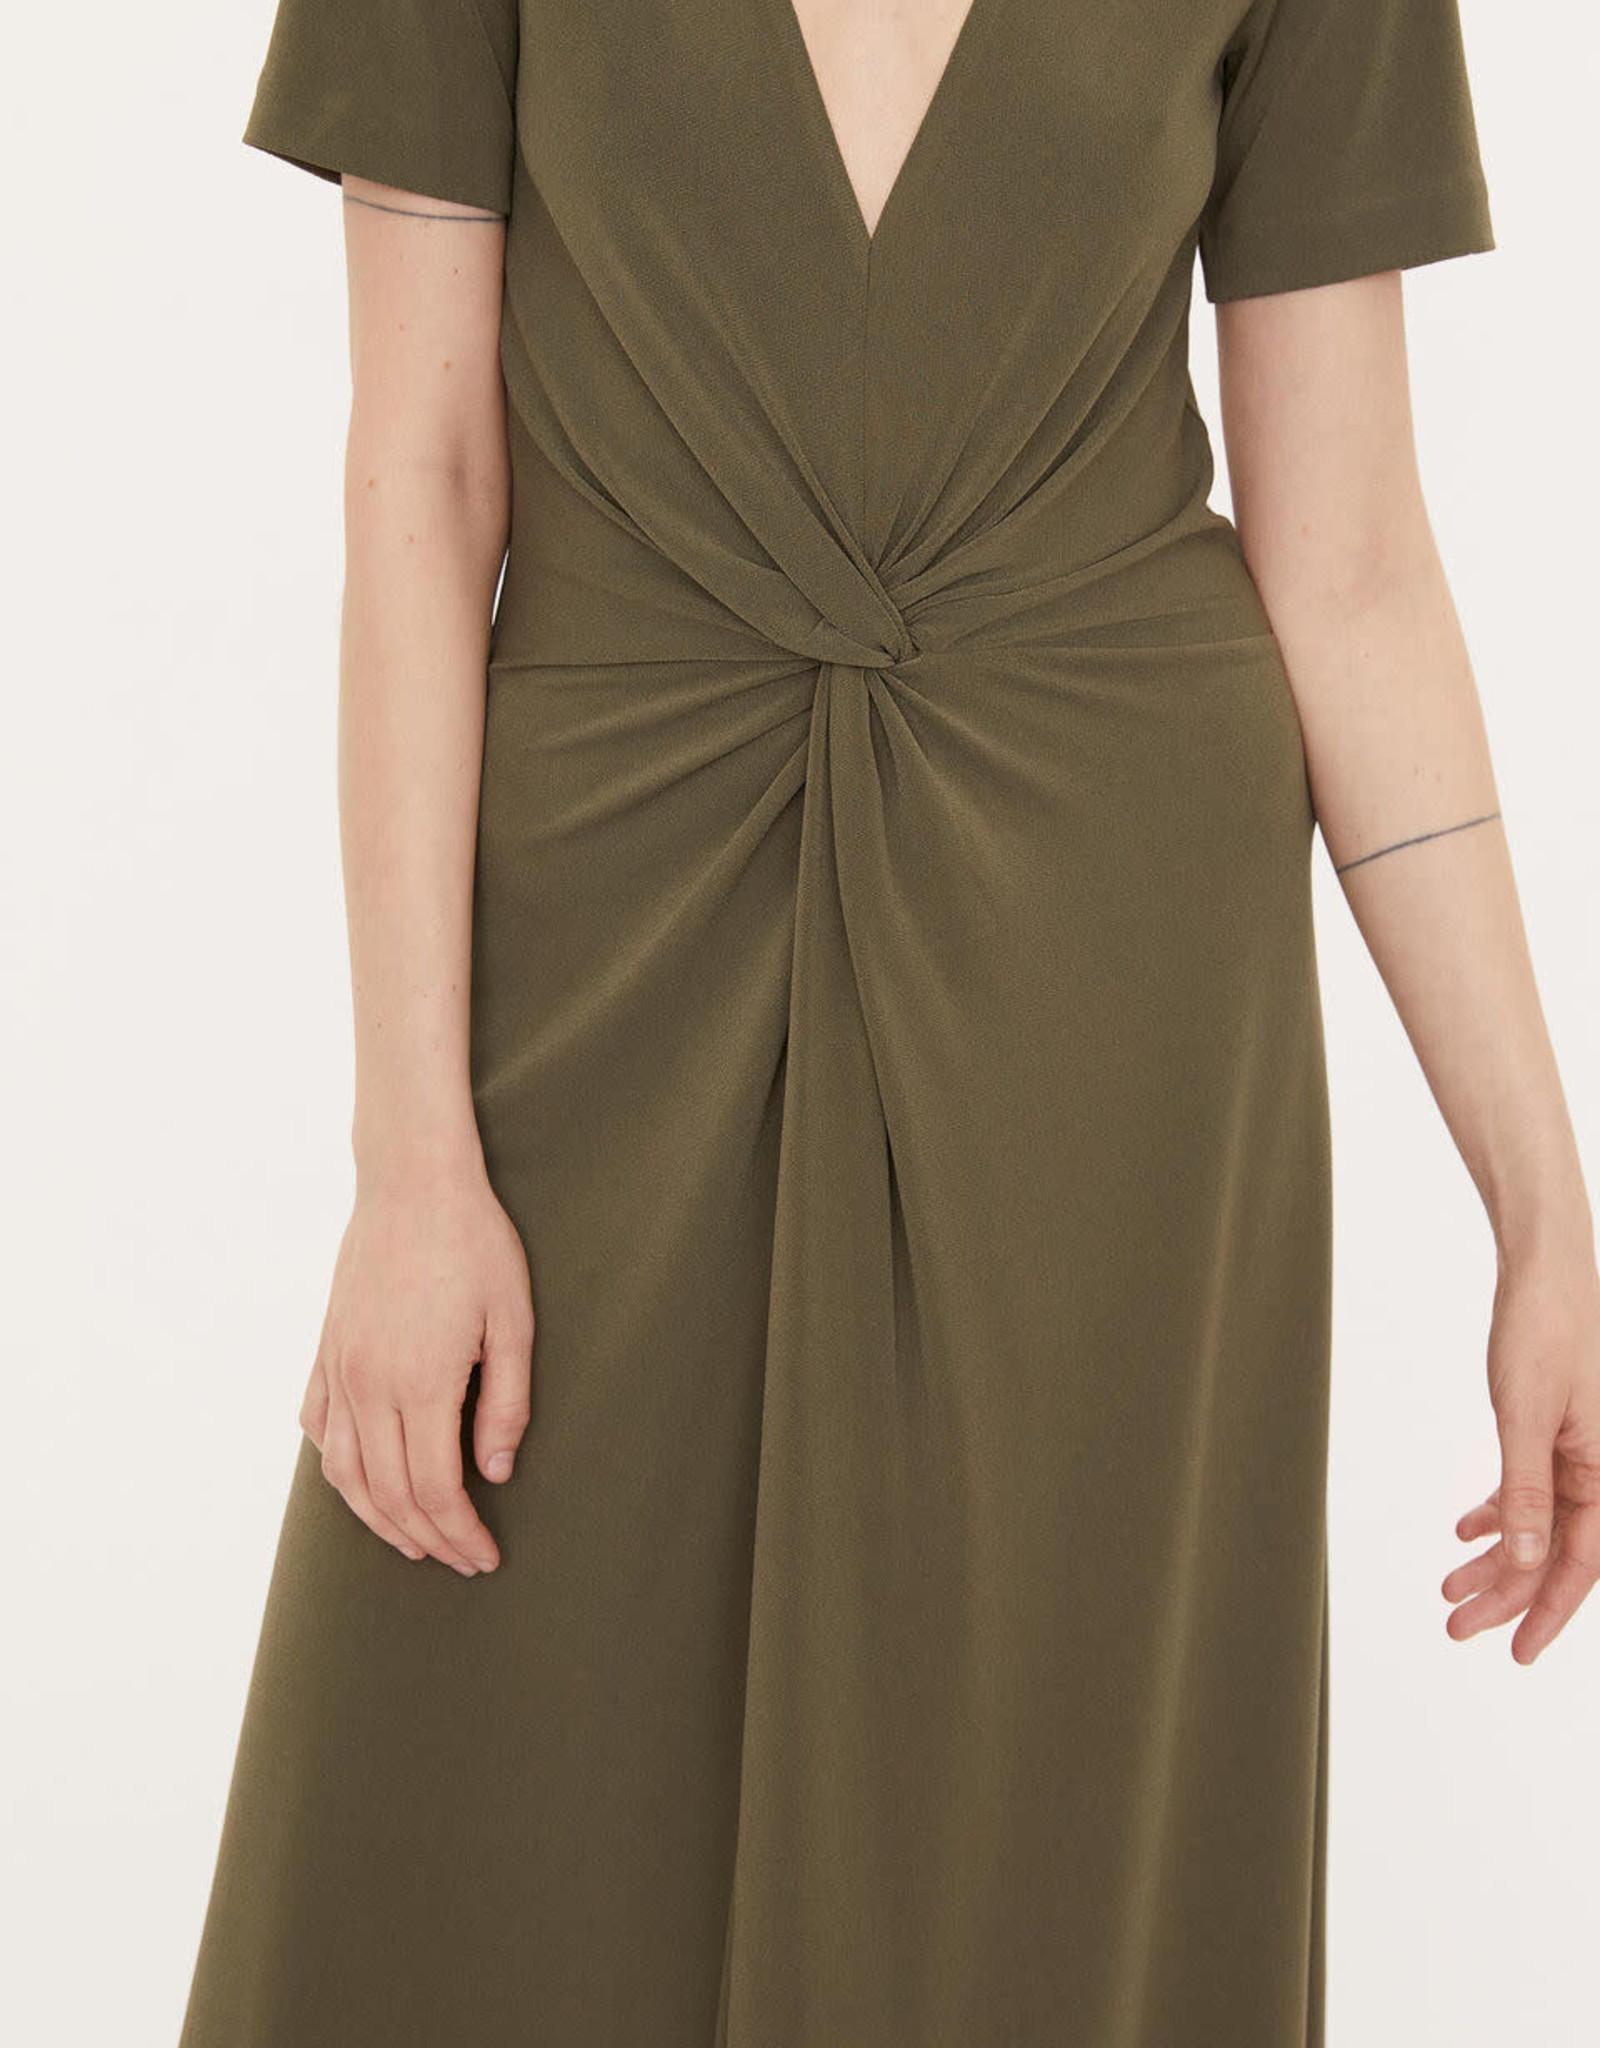 BY MALENE BIRGER The Pricilla Dress